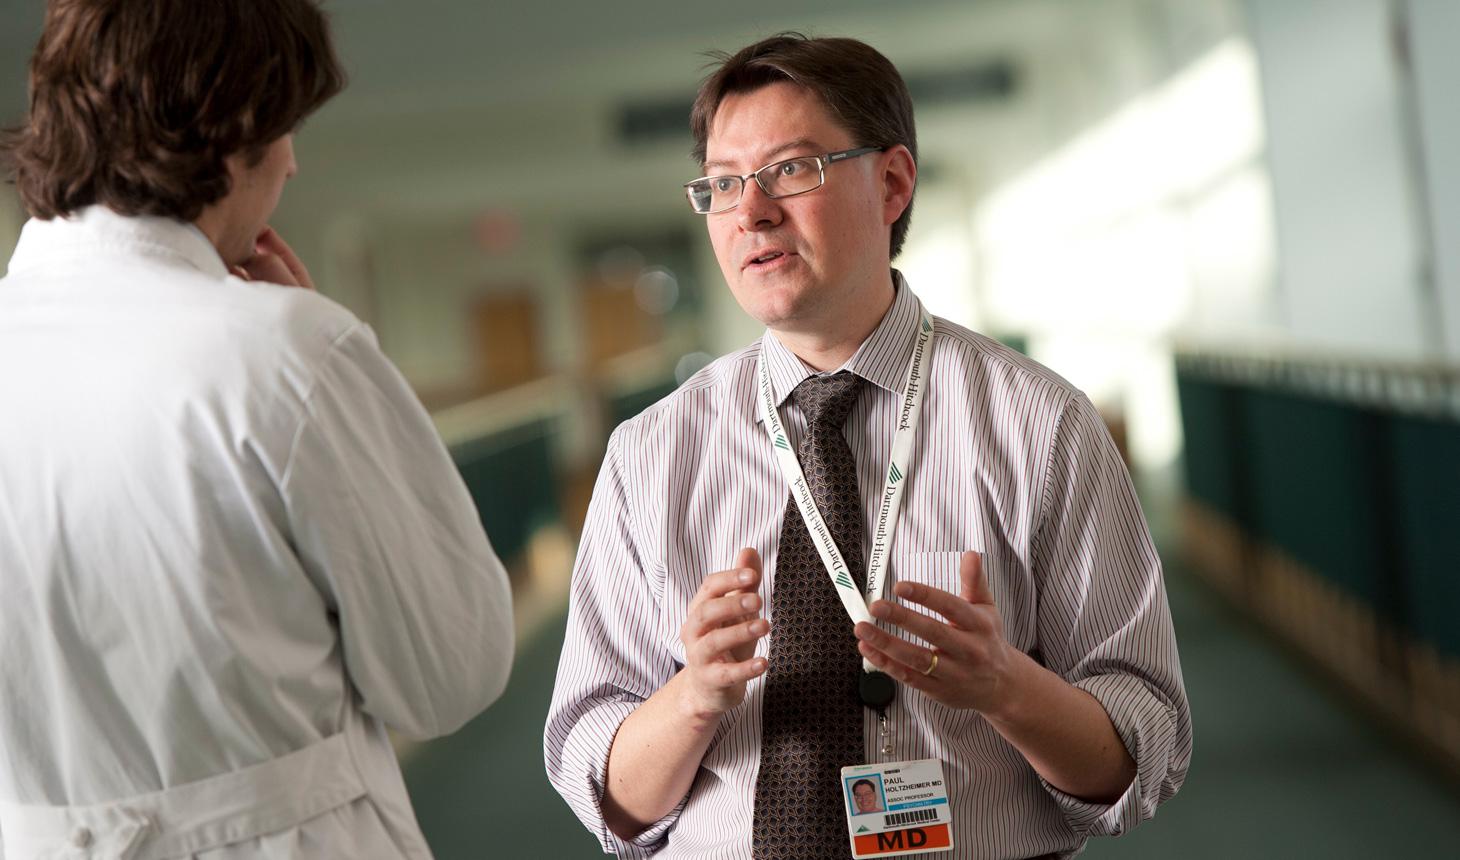 Paul Holtzheimer, MD, MS